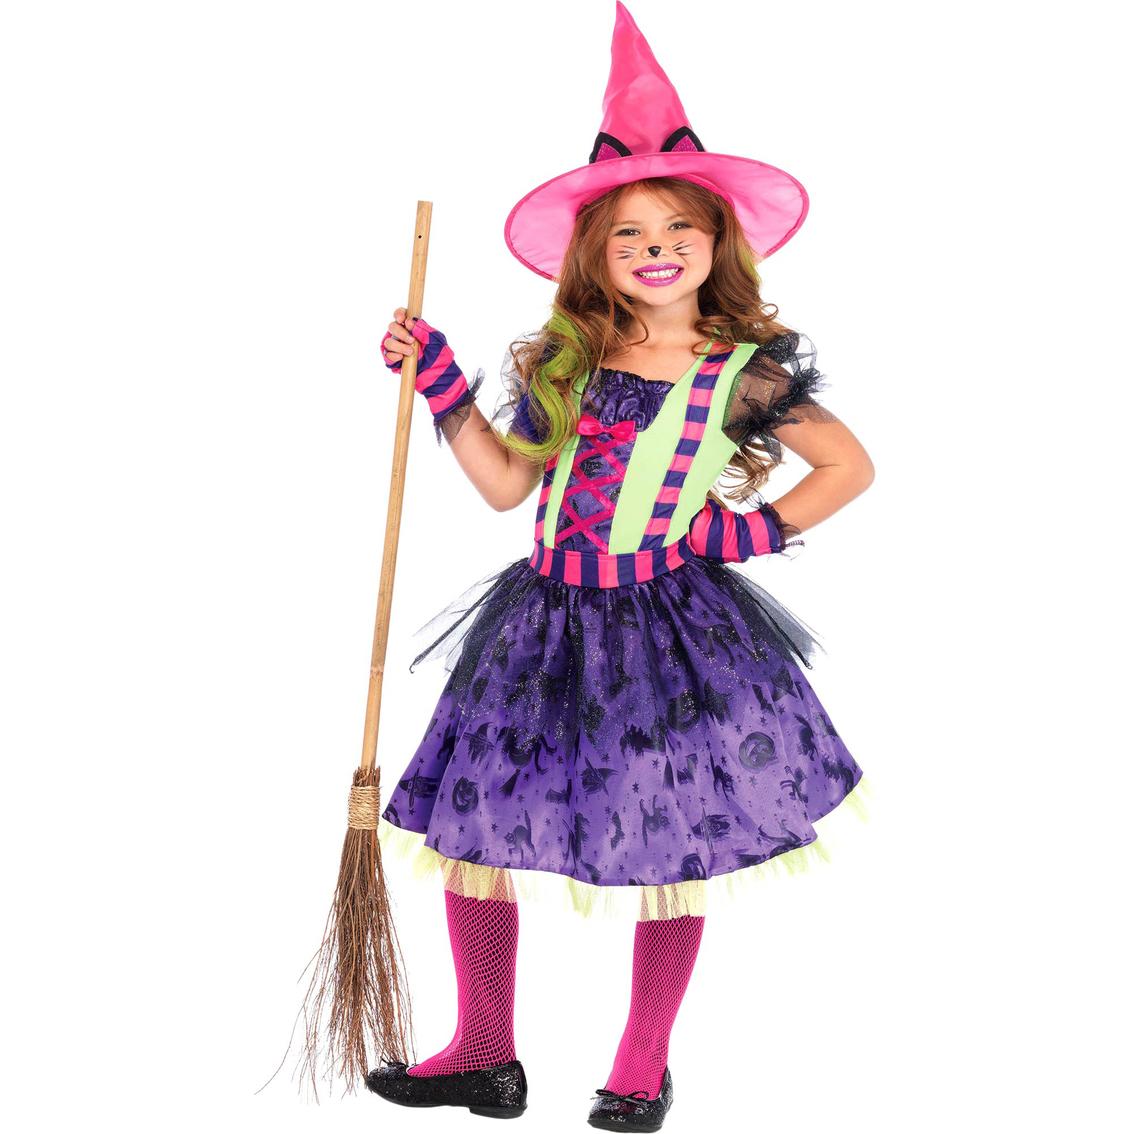 Theater costume  Black Kitty Cat Dress Up Kids Girl Halloween Pretend Play